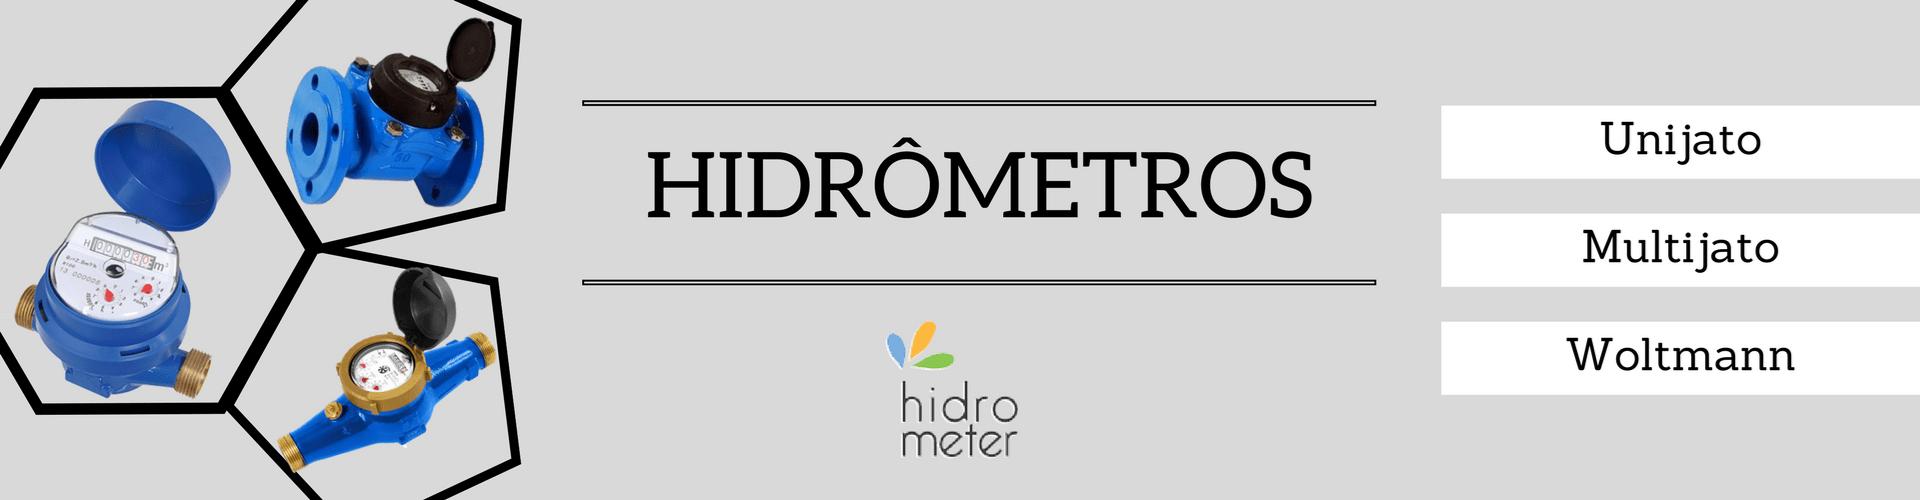 Hidrometros